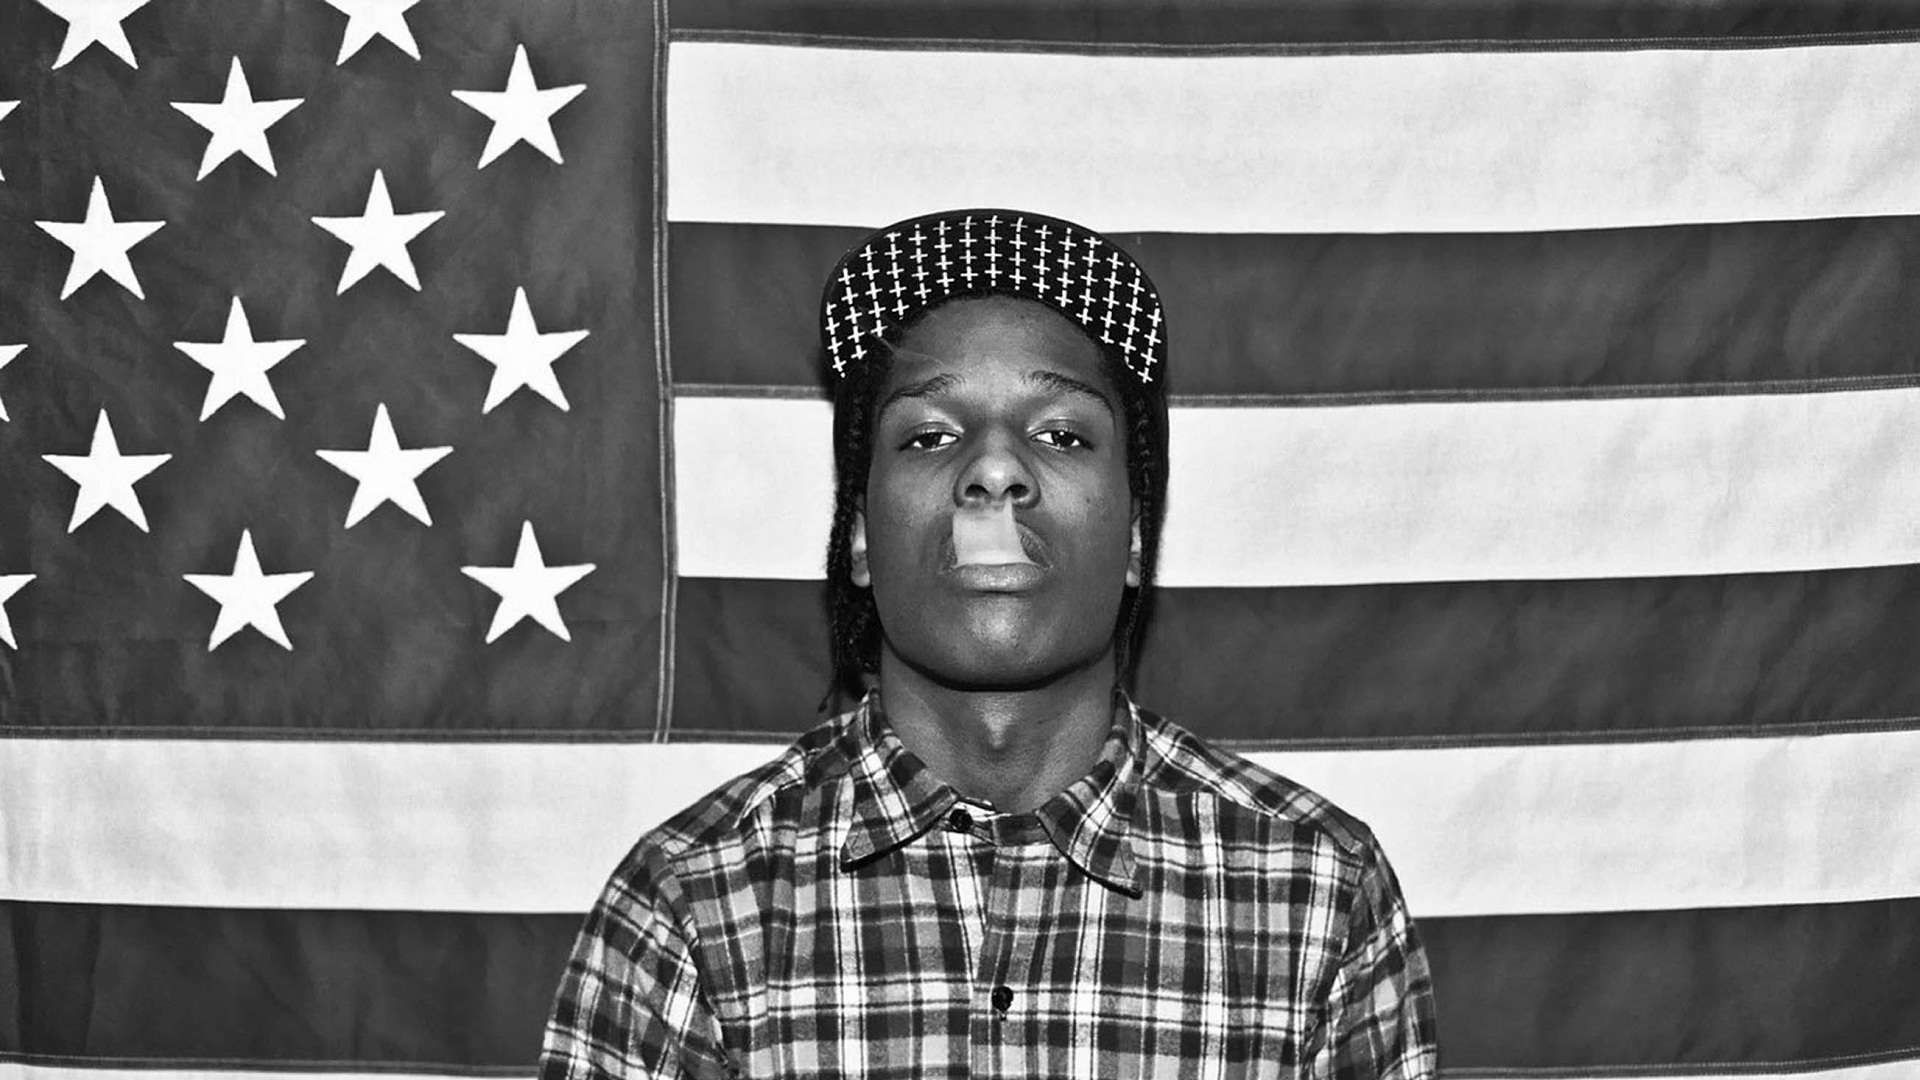 2018 Rapper Wallpapers Top Free 2018 Rapper Backgrounds